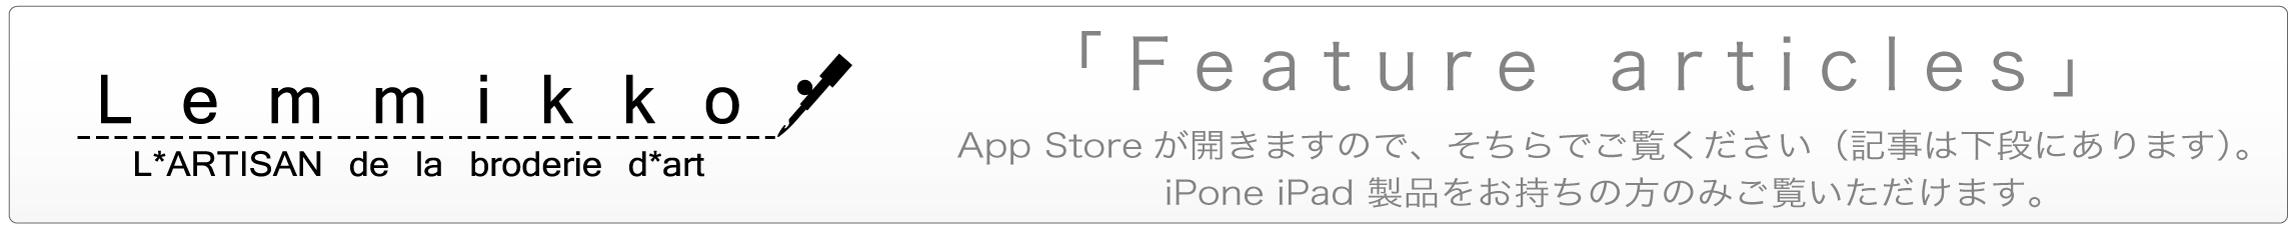 mac特集記事